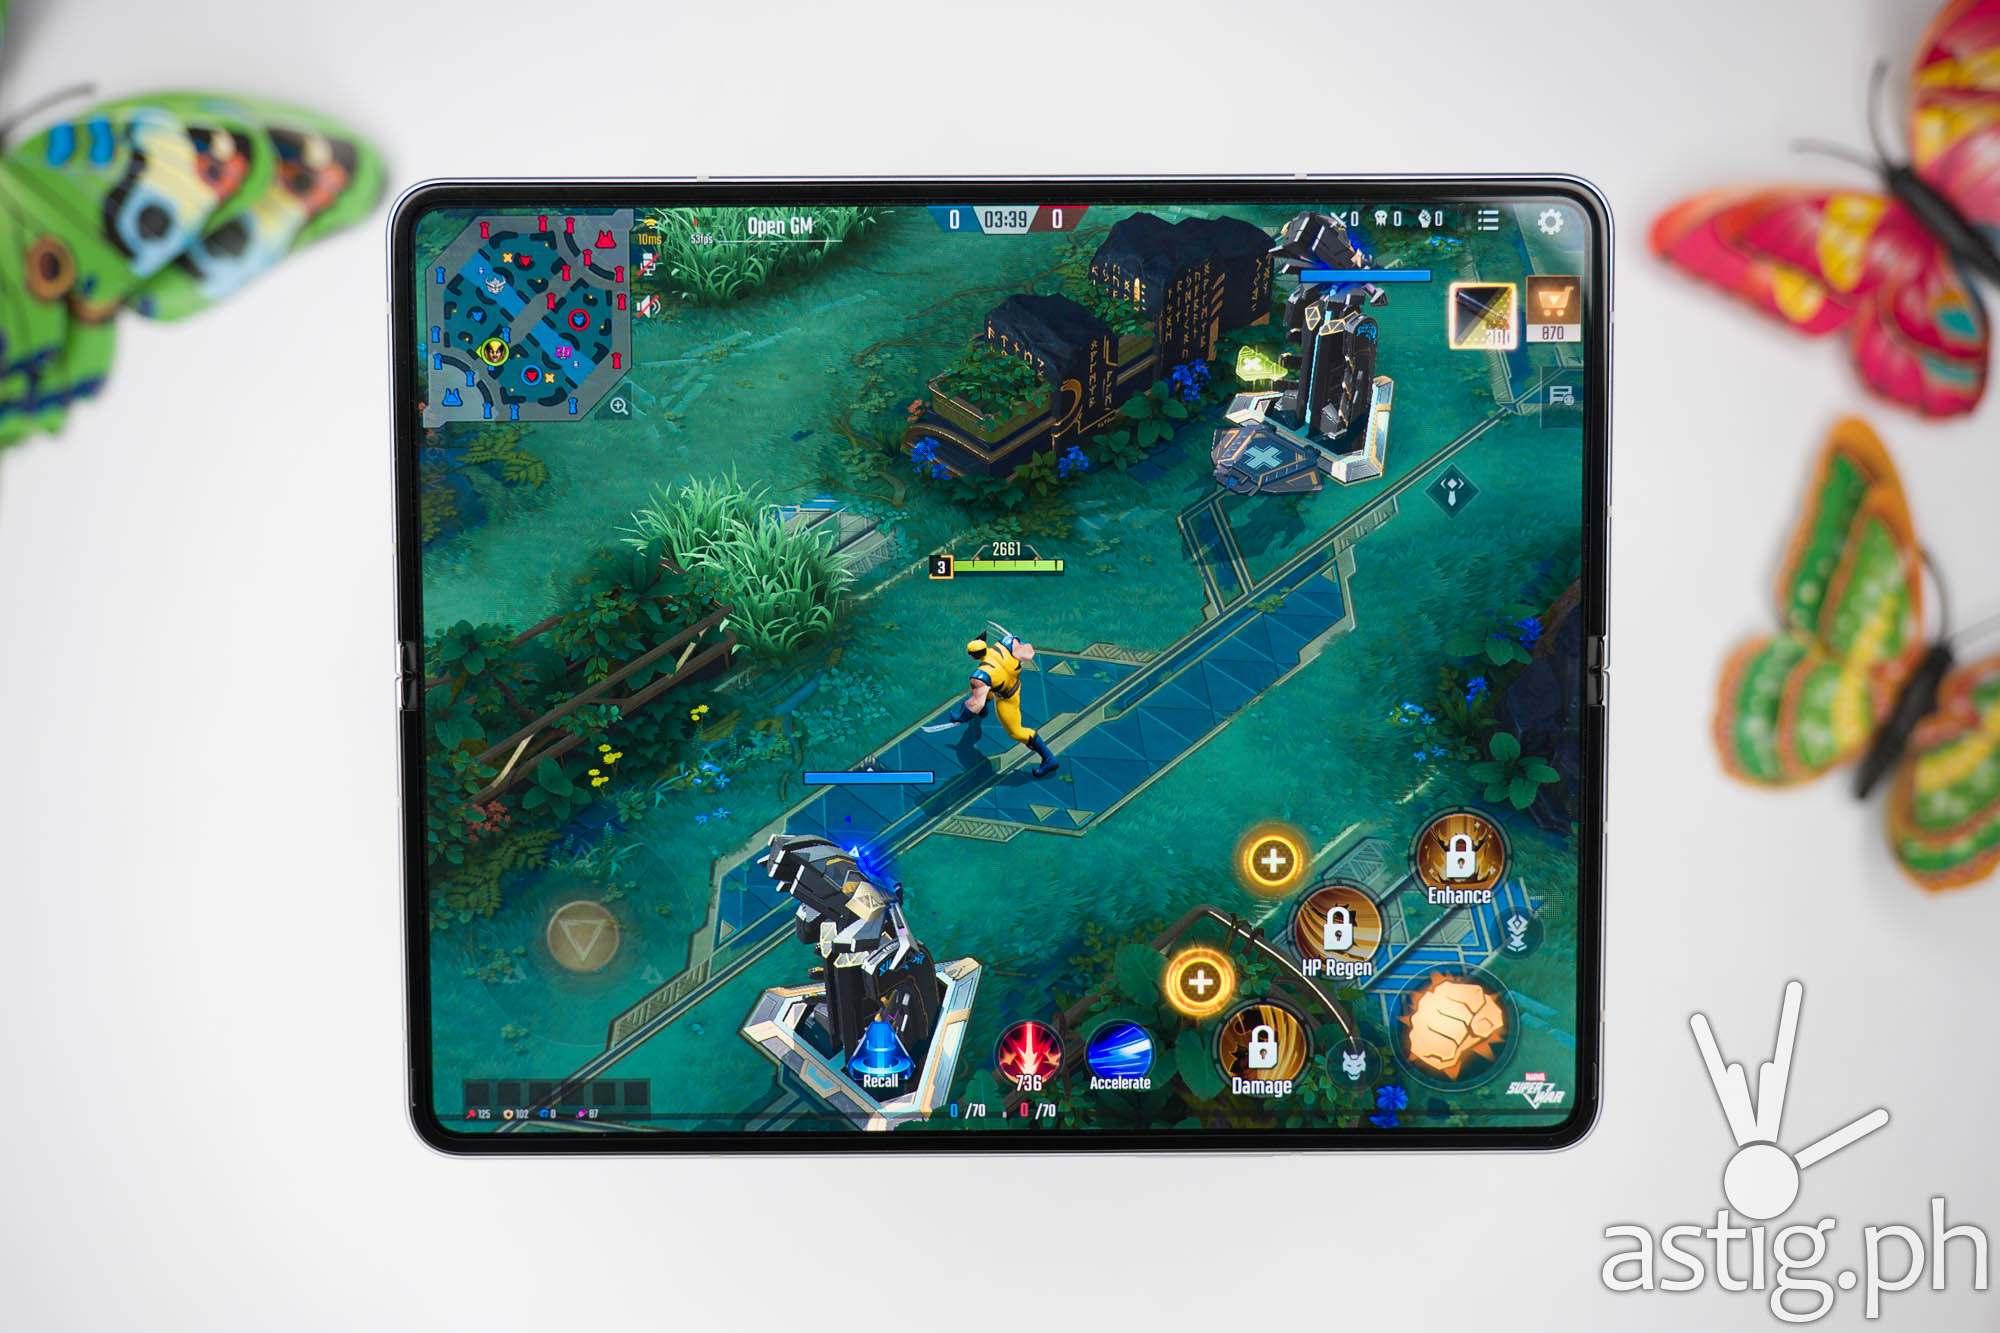 Marvel Super War MOBA game - SAMSUNG Galaxy Z Fold3 5G (Philippines)